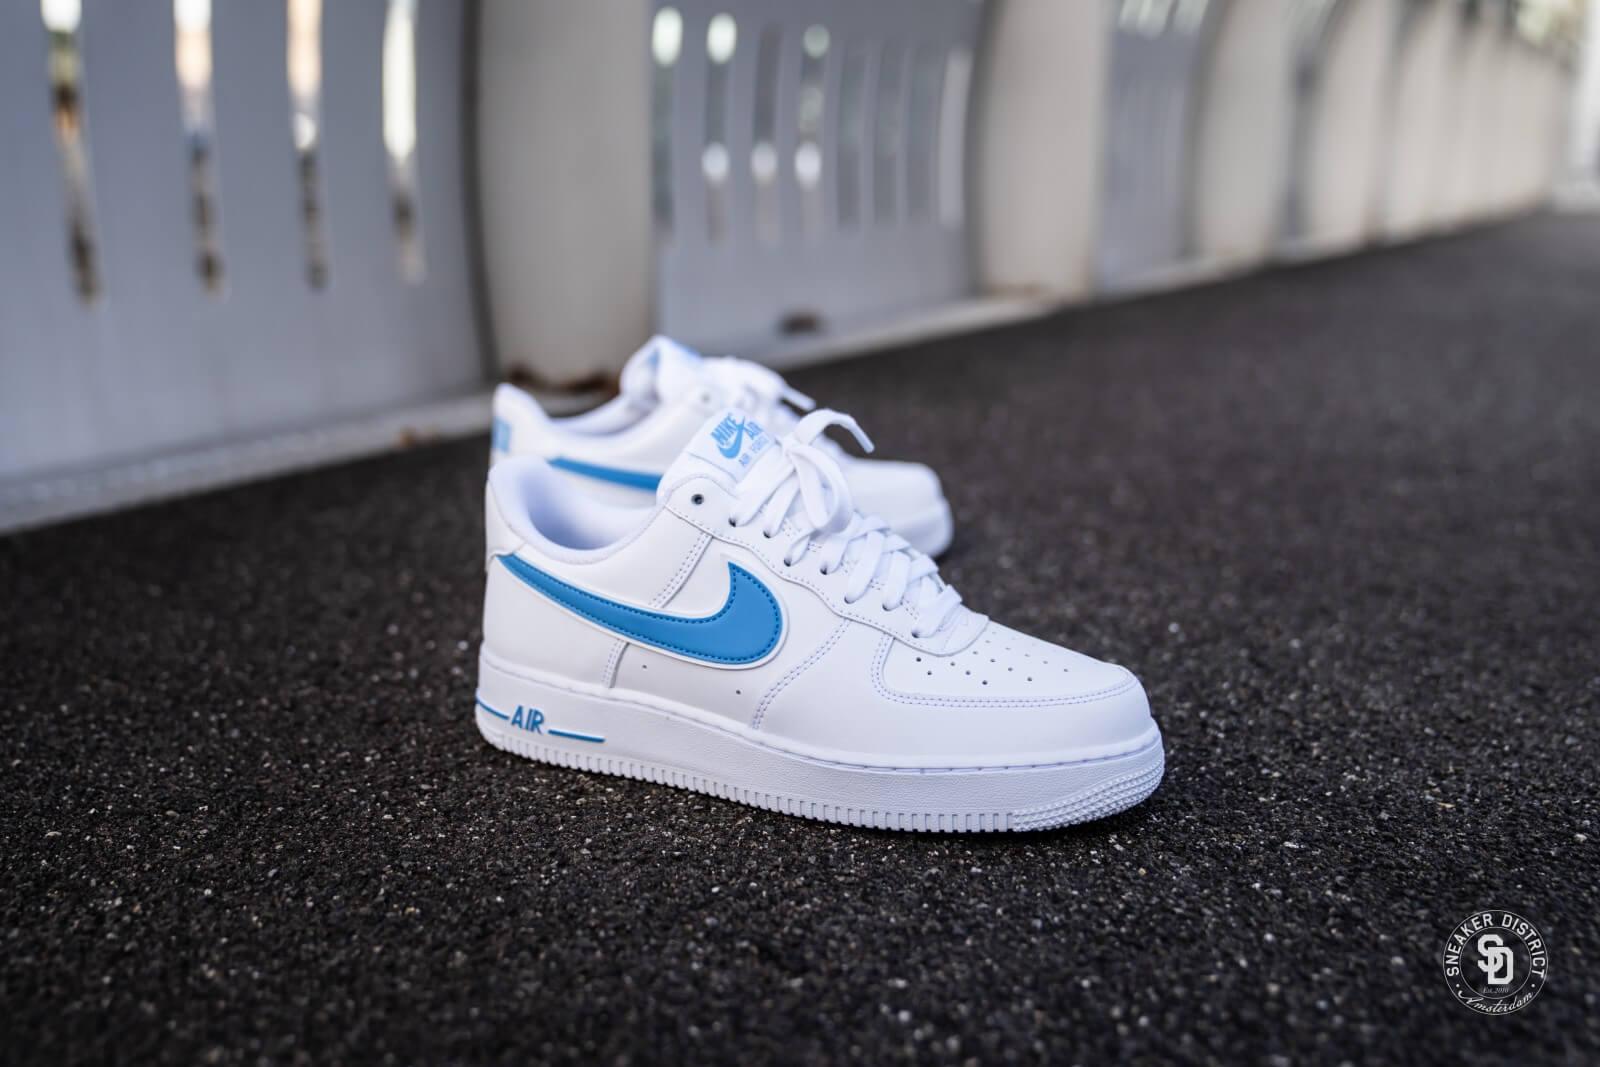 Nike Air Force 1 '07 3 White/University Blue